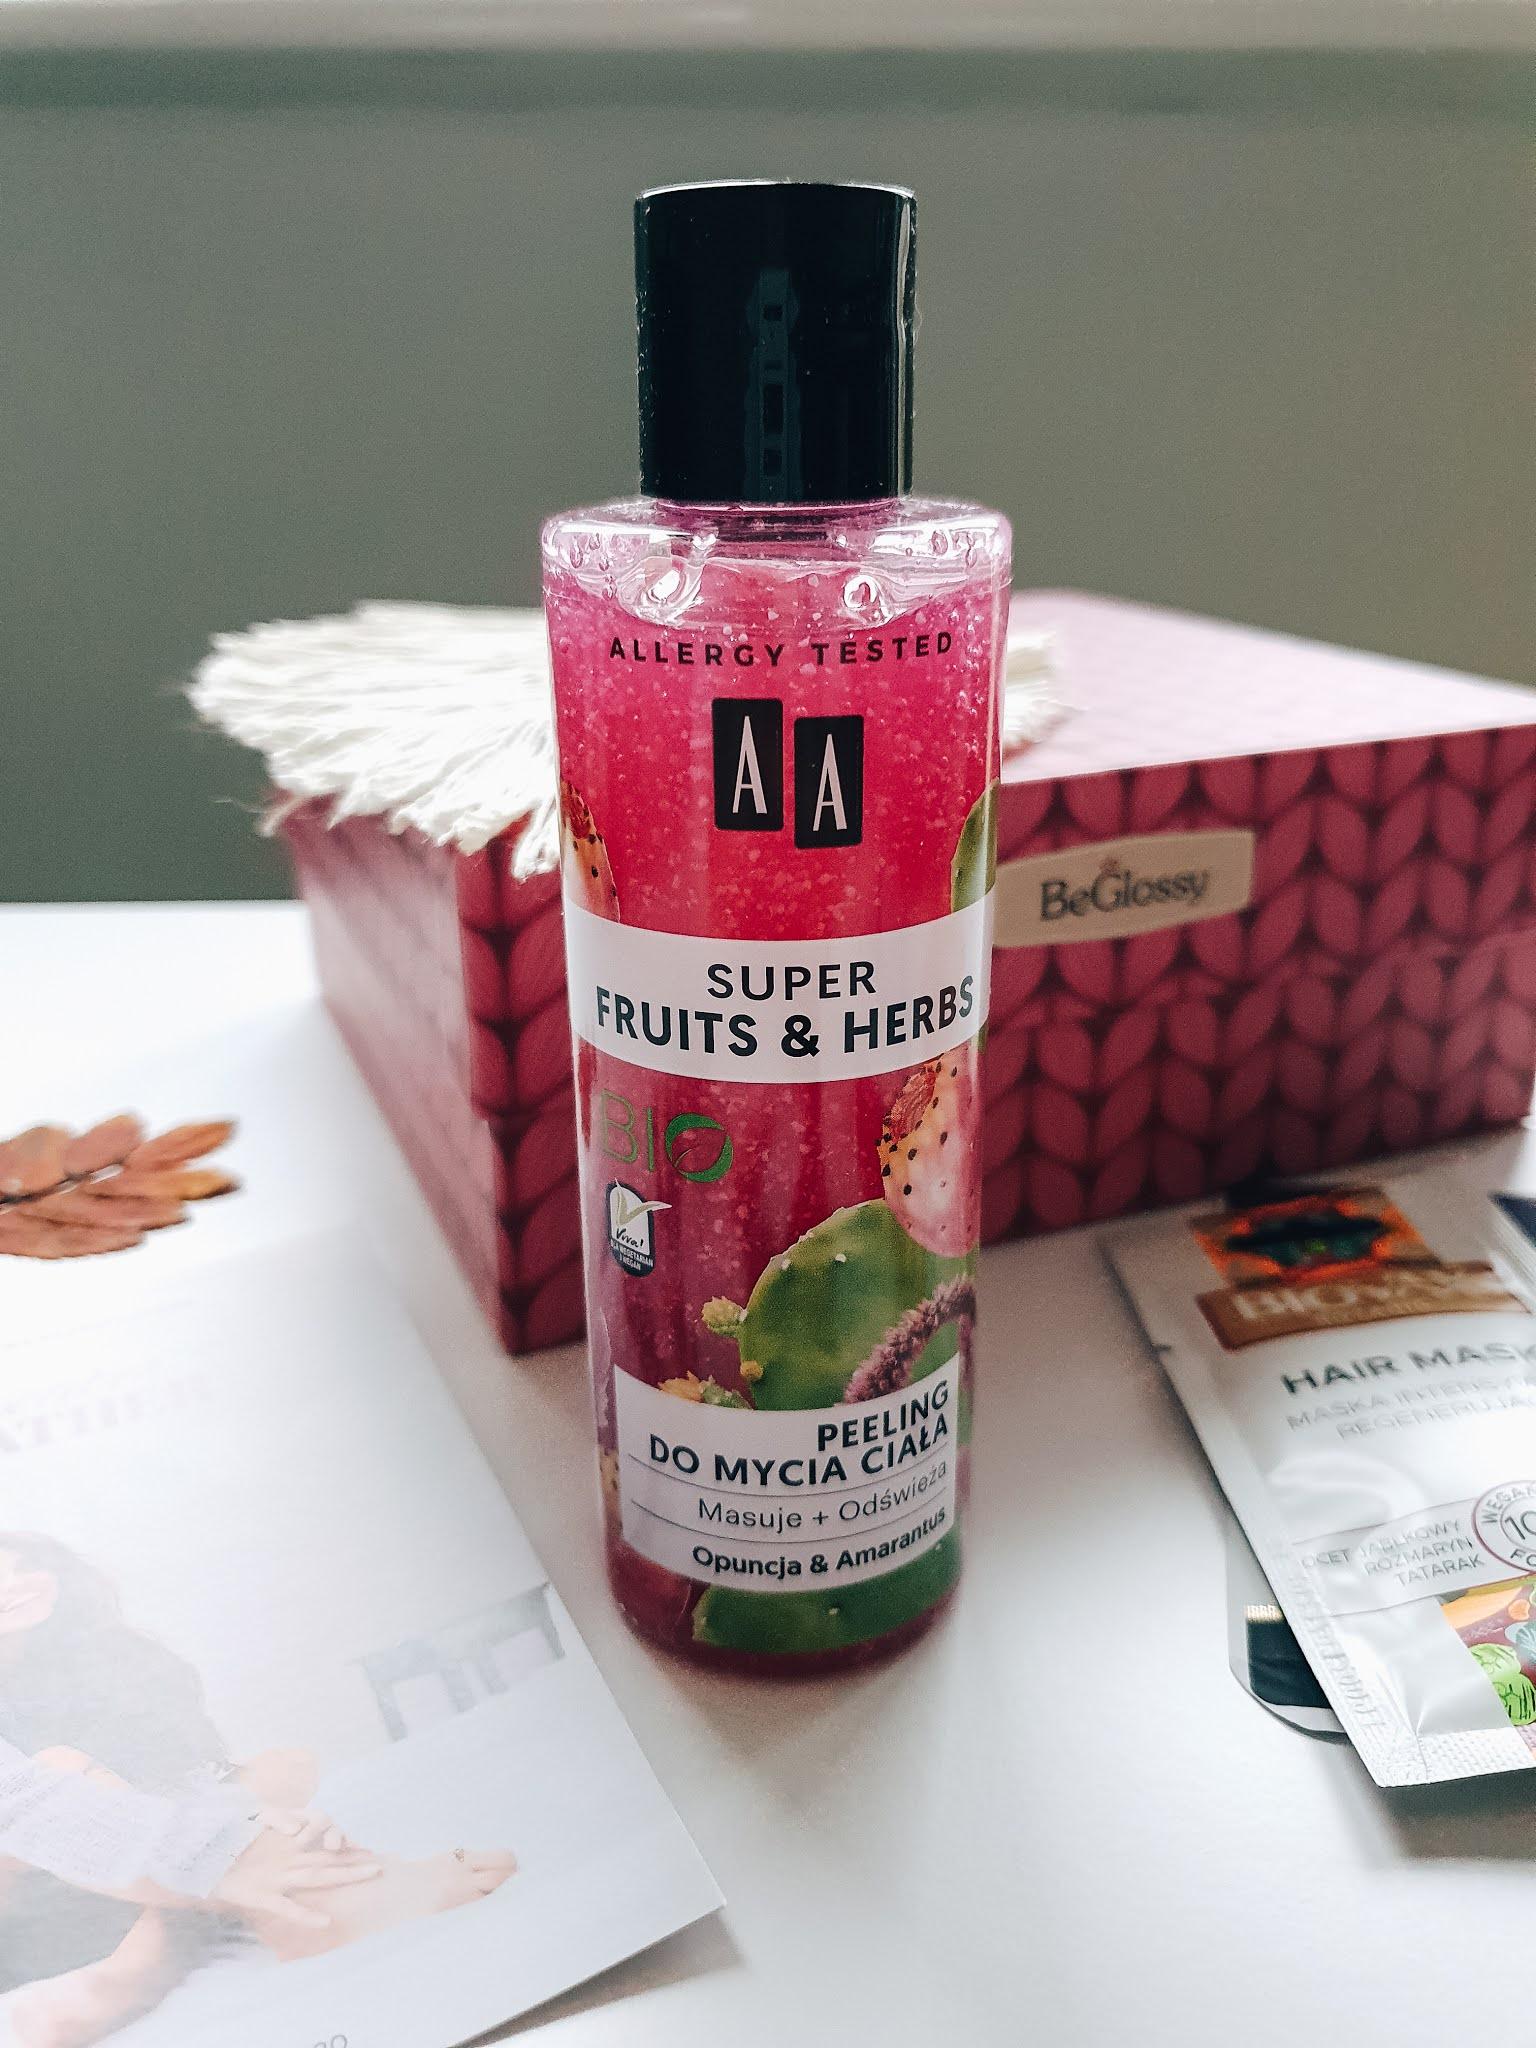 AA Super Fruits & Herbs - peeling do ciała opuncja i amarantus